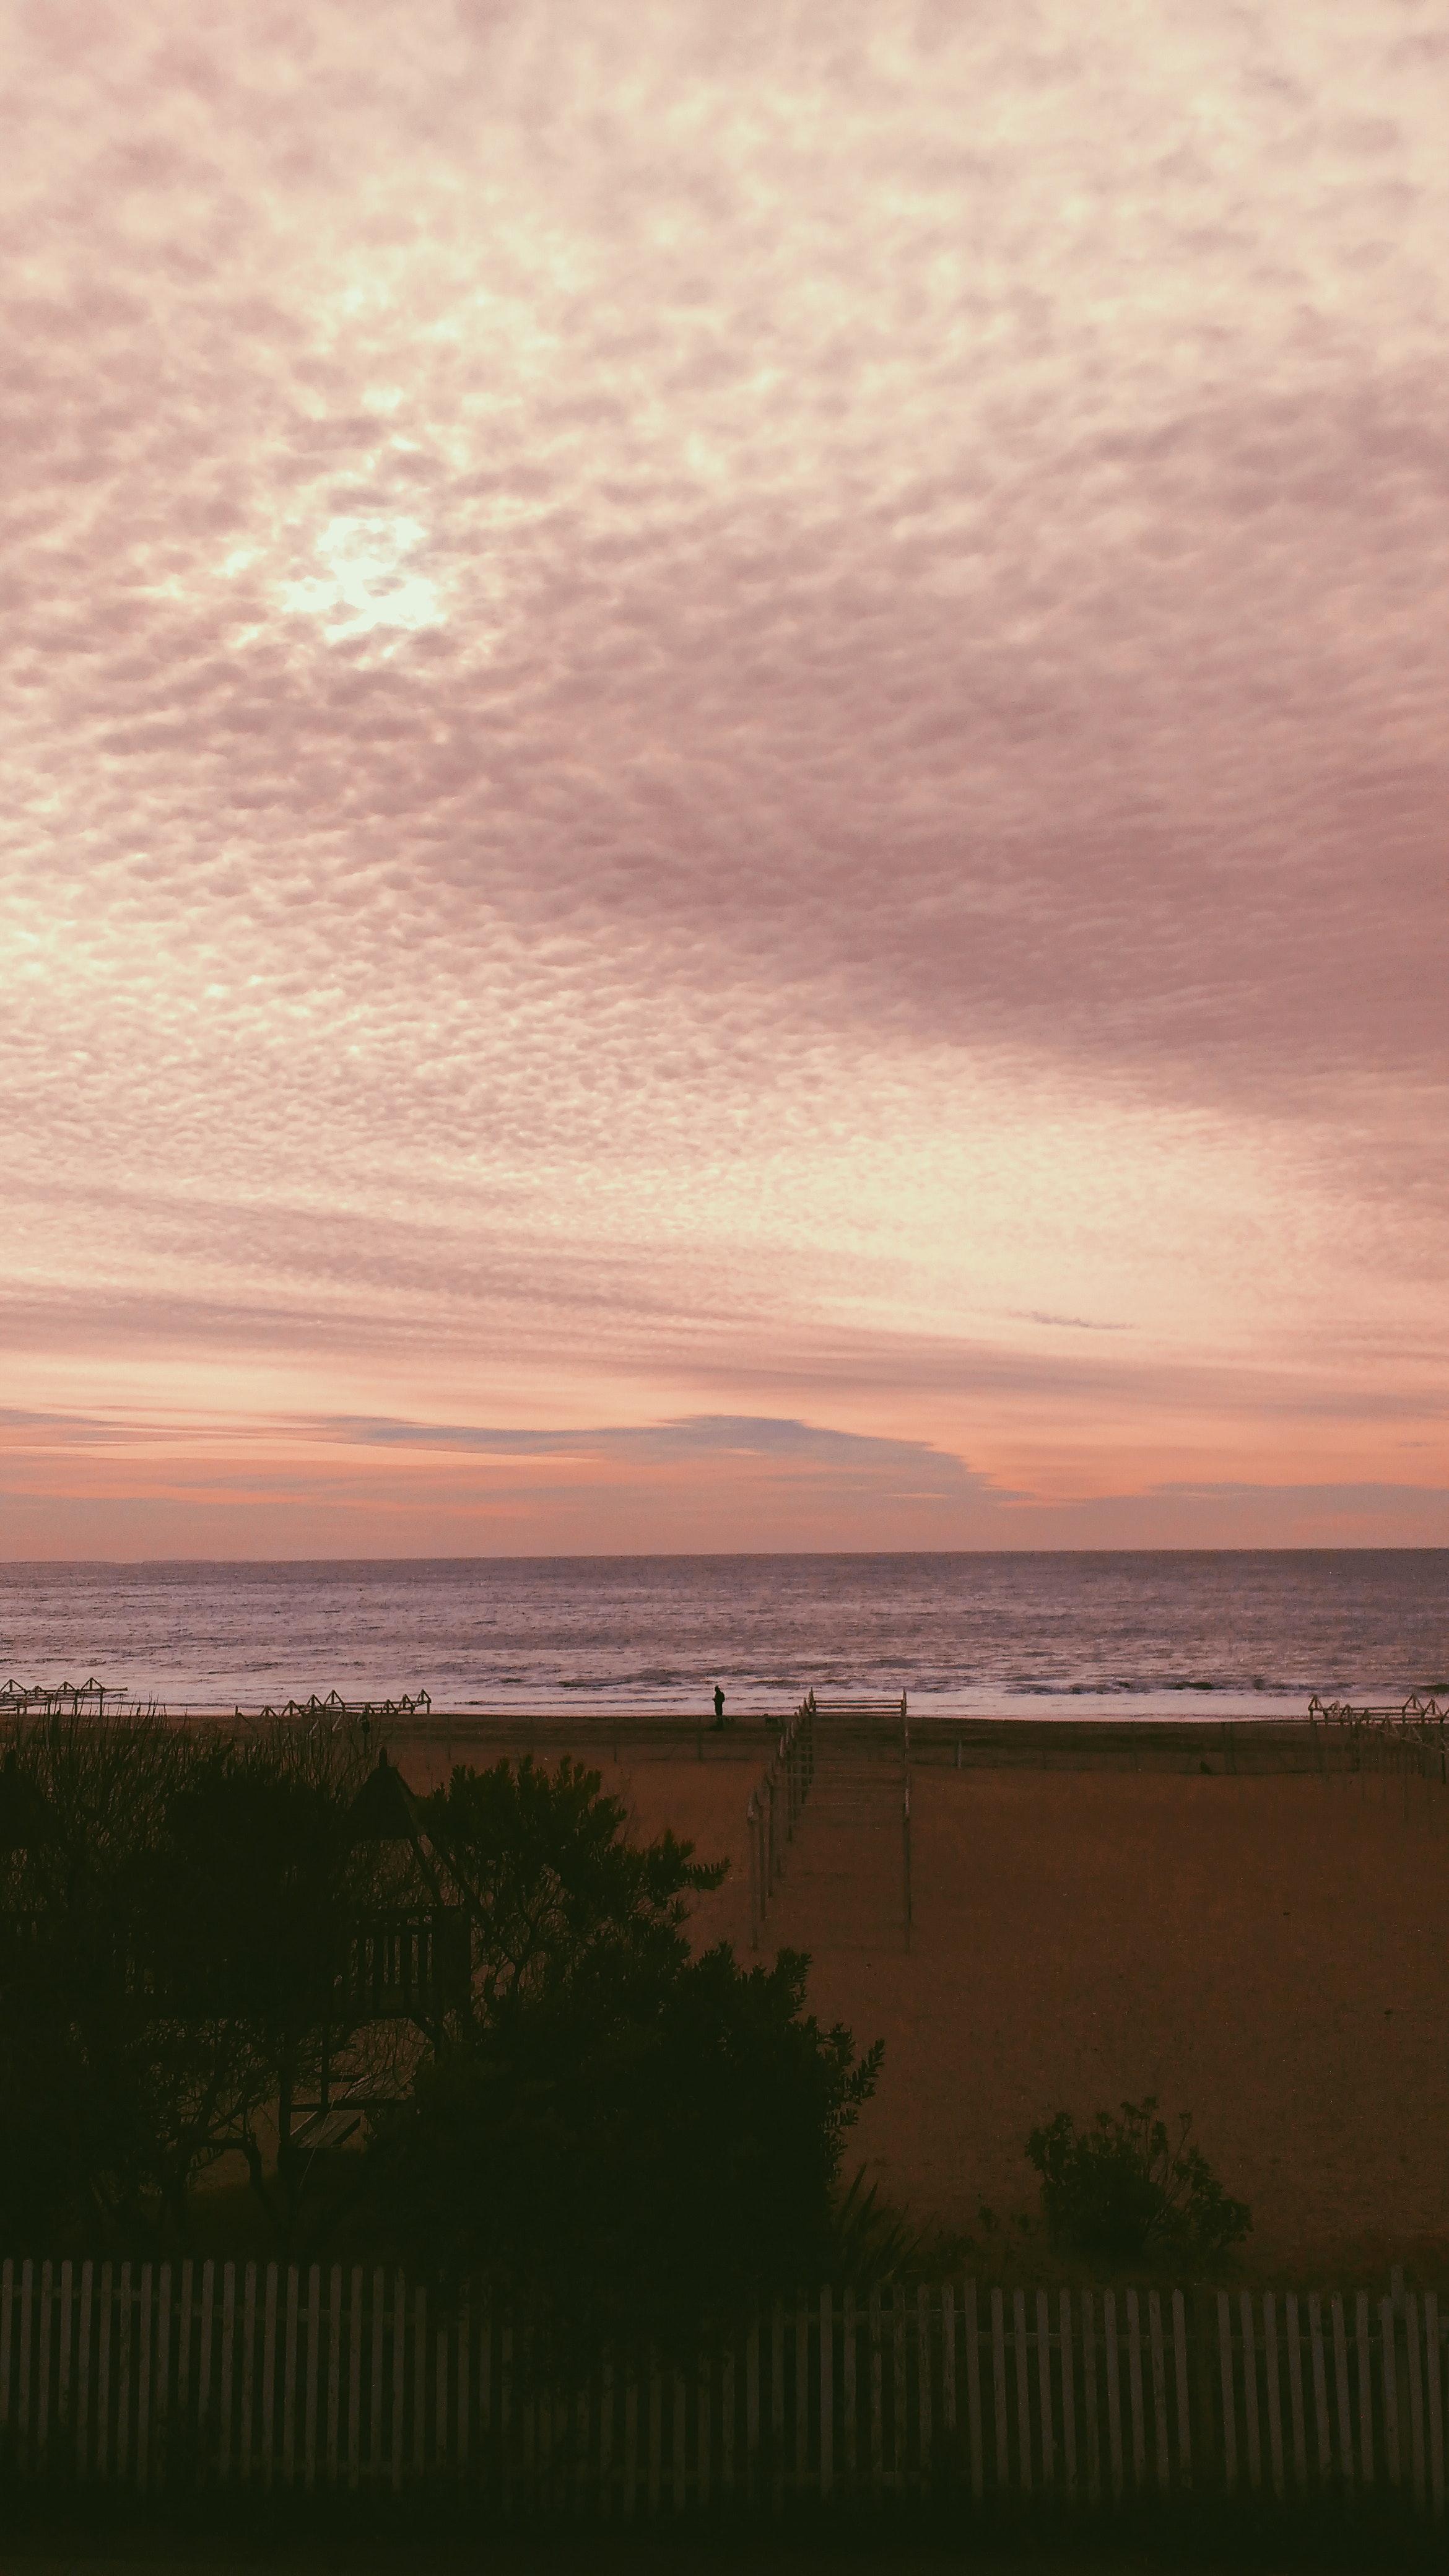 pexels photo 1432154.jpeg?cs=srgb&dl=garis pantai kehidupan pantai wallpaper tumblr 1432154